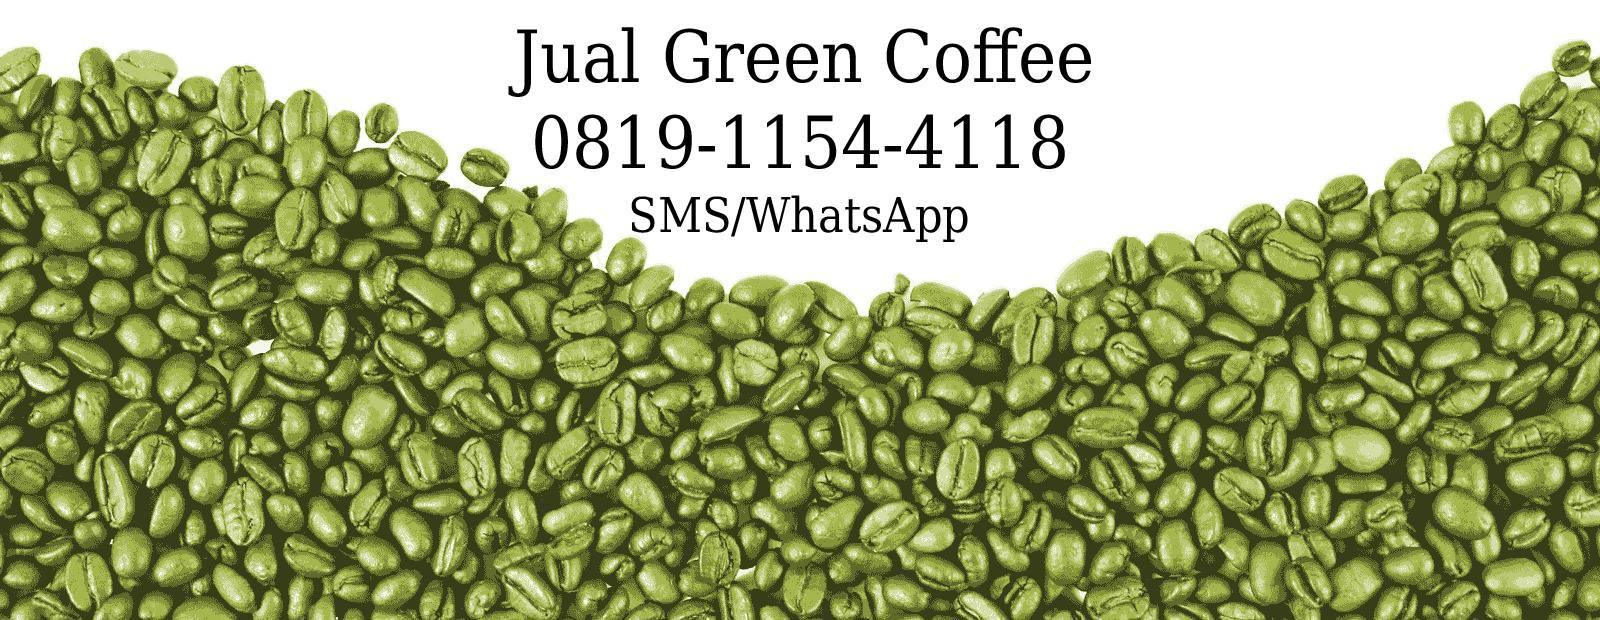 Shea terra argan and green coffee reviews